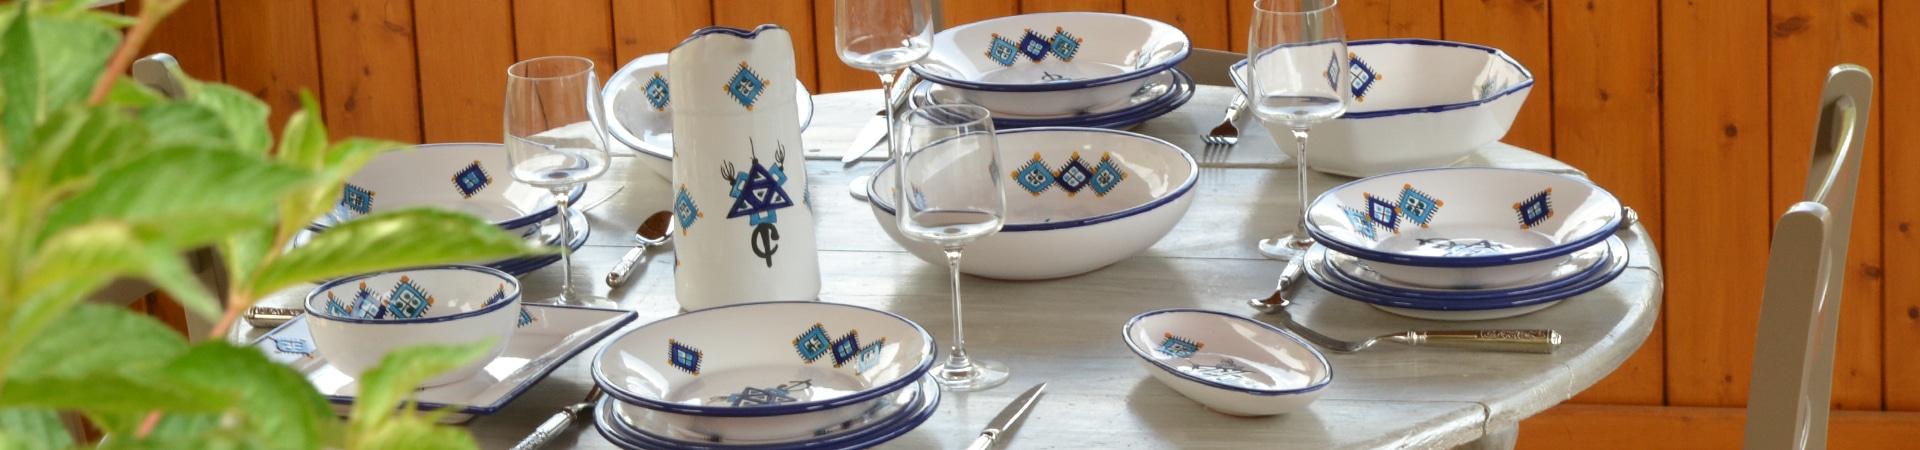 grossiste vaisselle orientale poterie